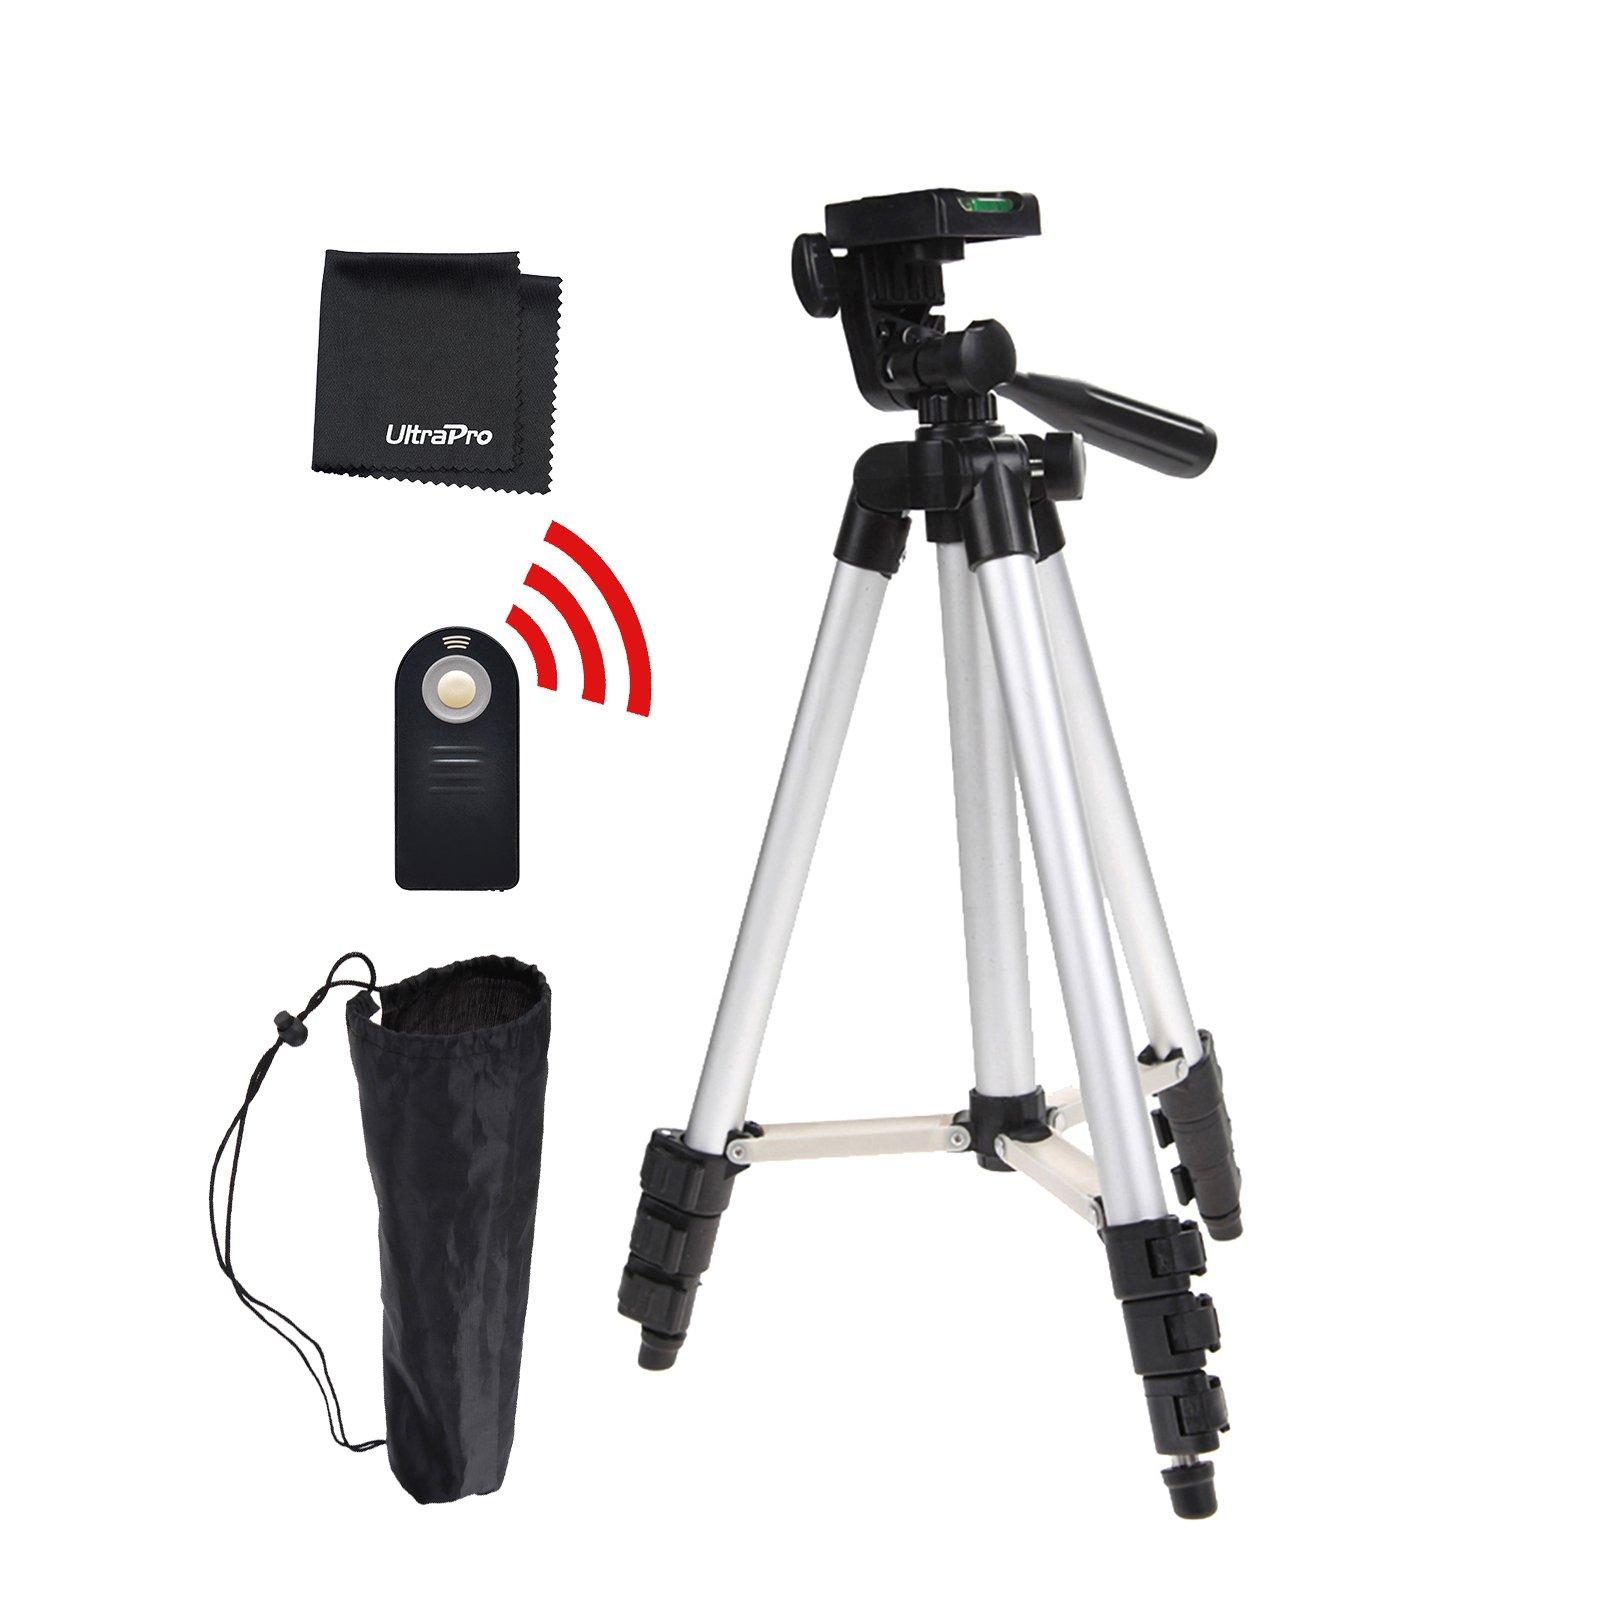 UltraPro 50'' Inch Full Size Aluminum Camera Tripod + Wireless Remote Bundle for Nikon Digital Cameras, Includes UltraPro Bonus Microfiber Cleaning Cloth